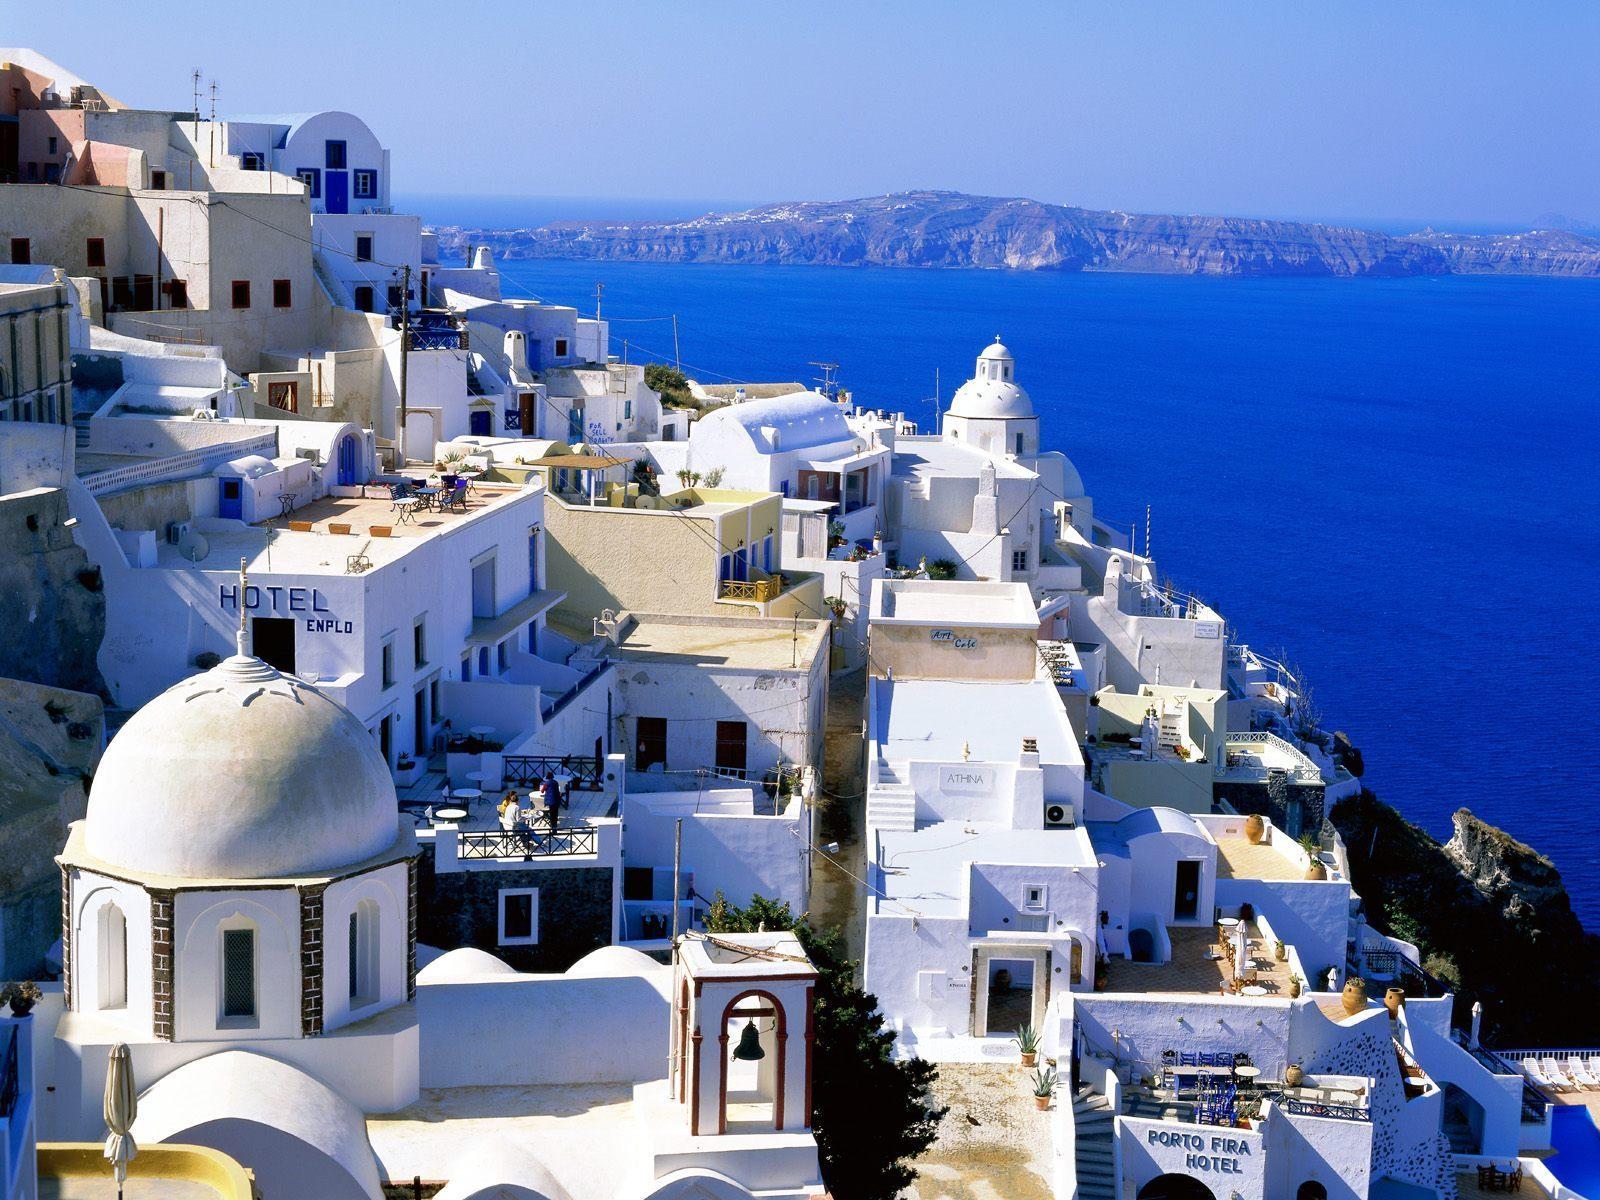 wallpaper santorini greece island - photo #38